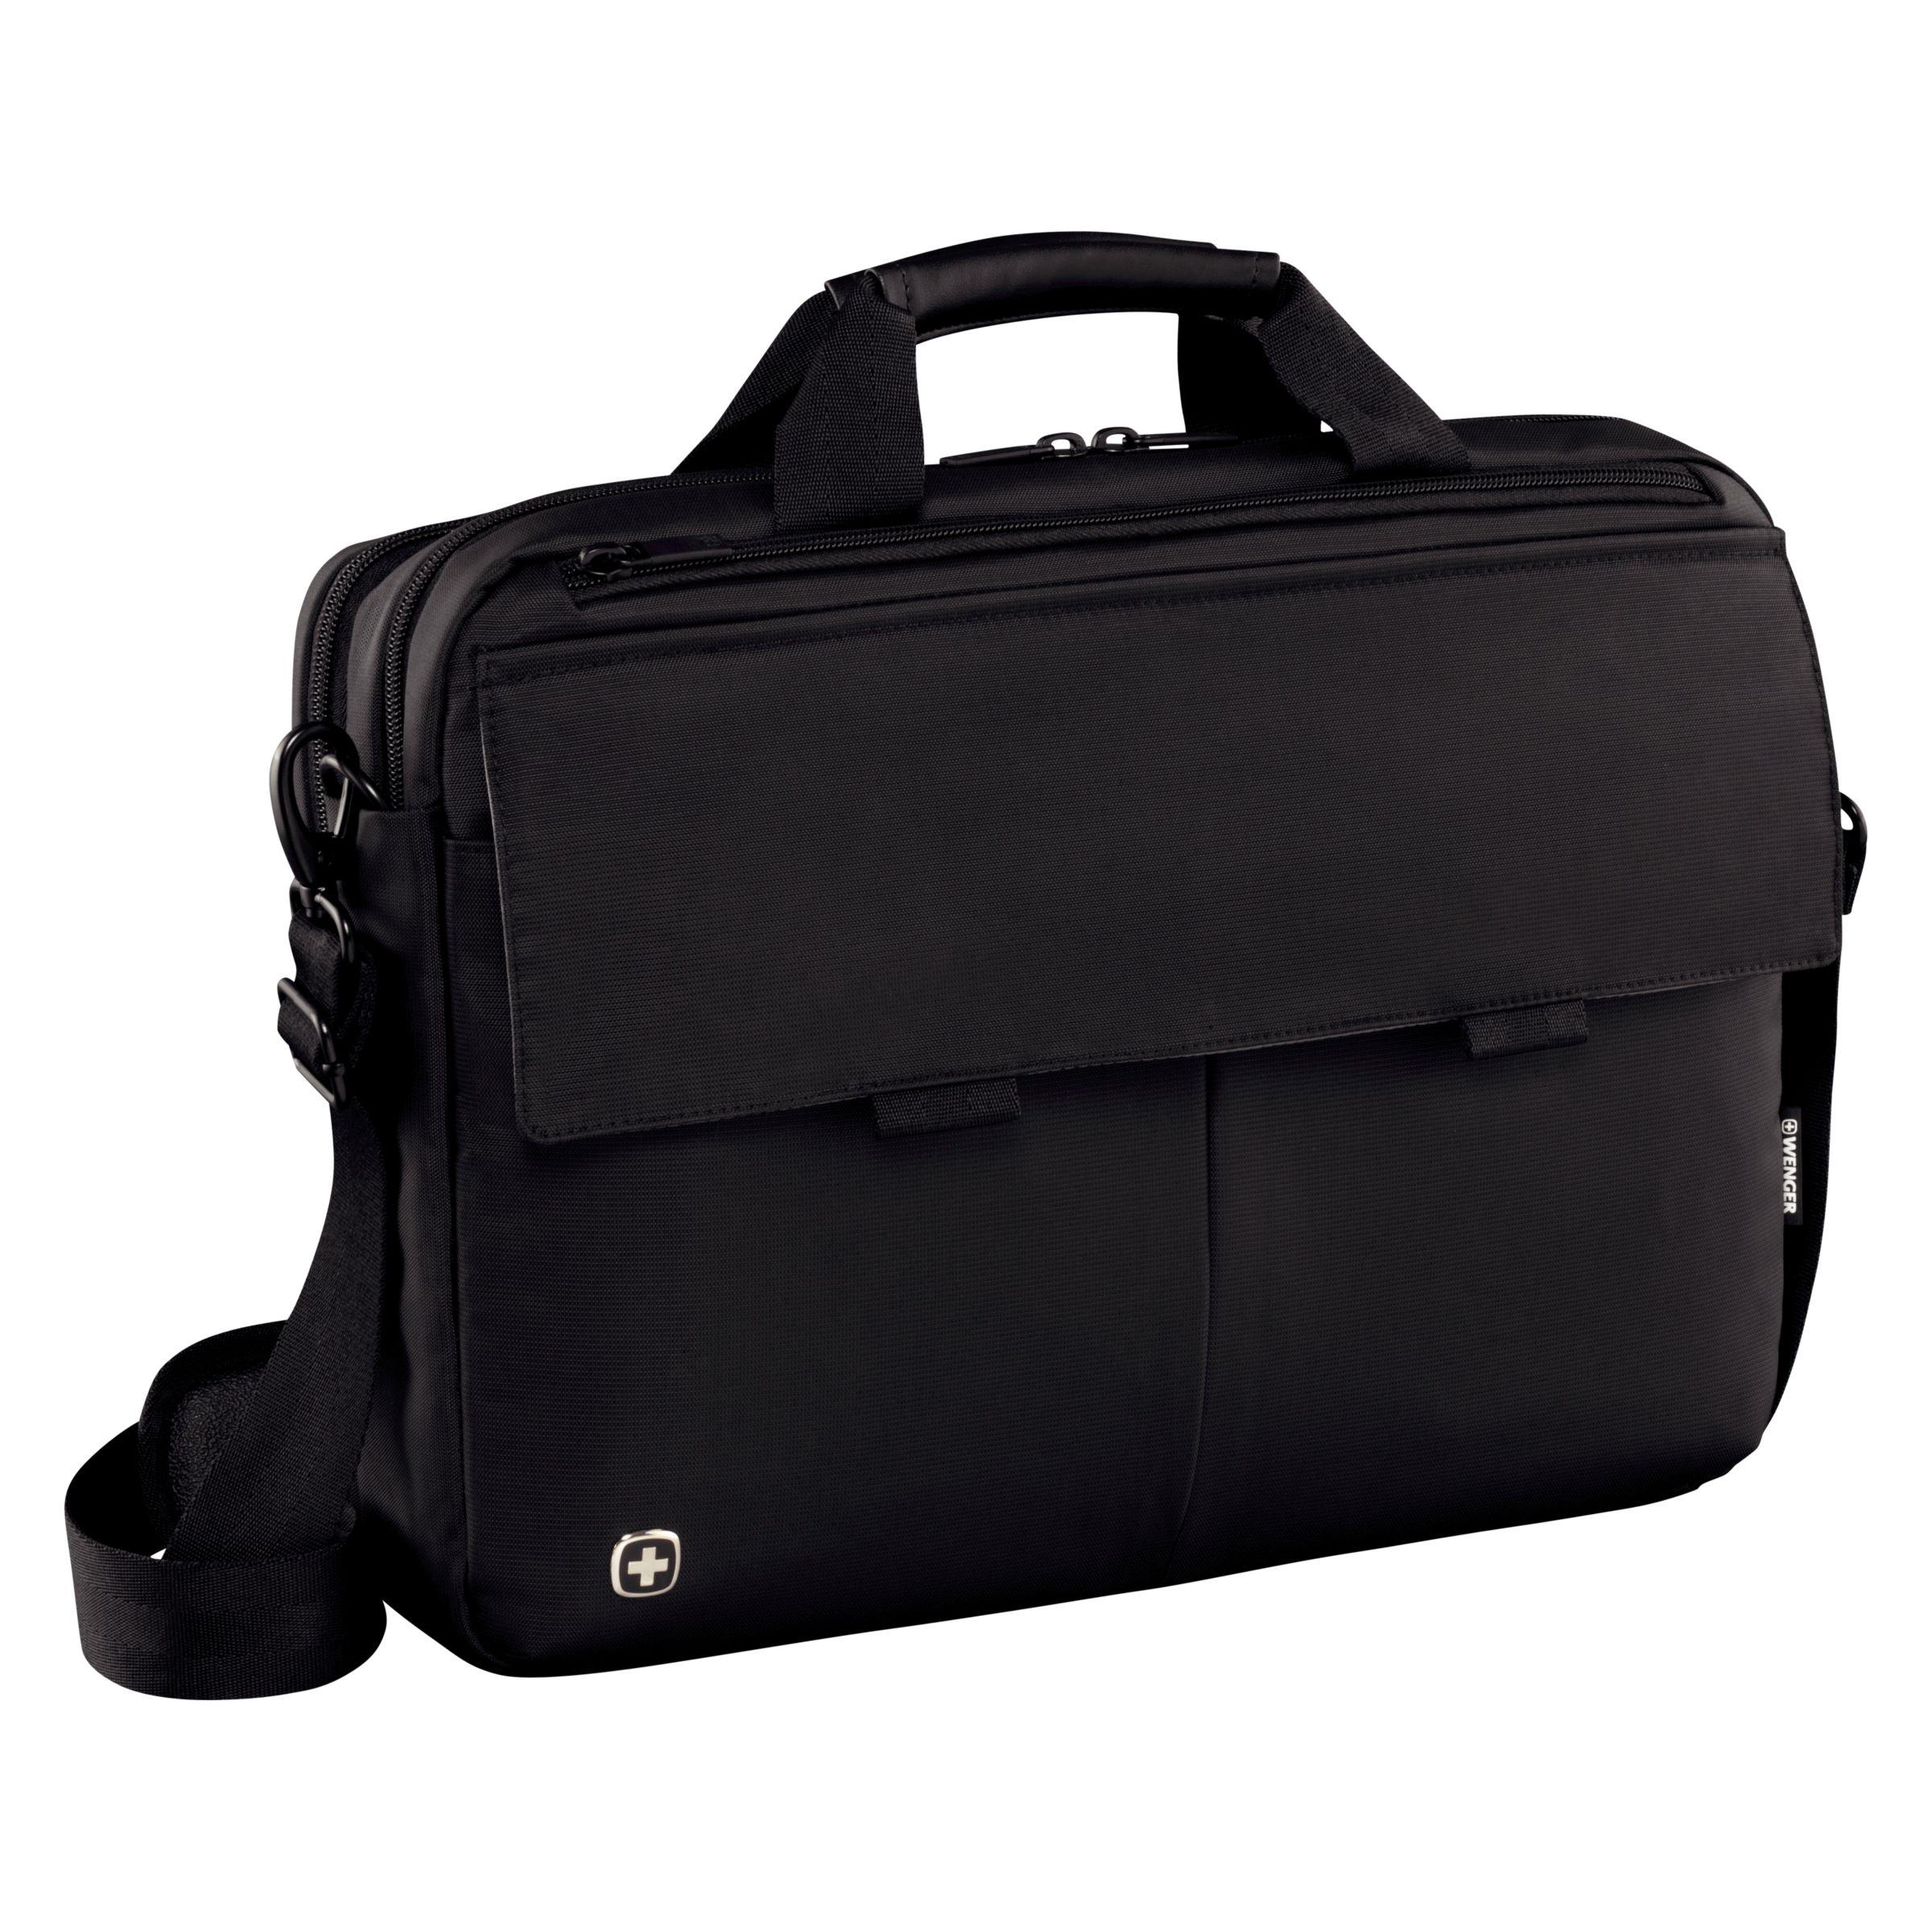 Wenger Wenger Route 16 Laptop Messenger Bag